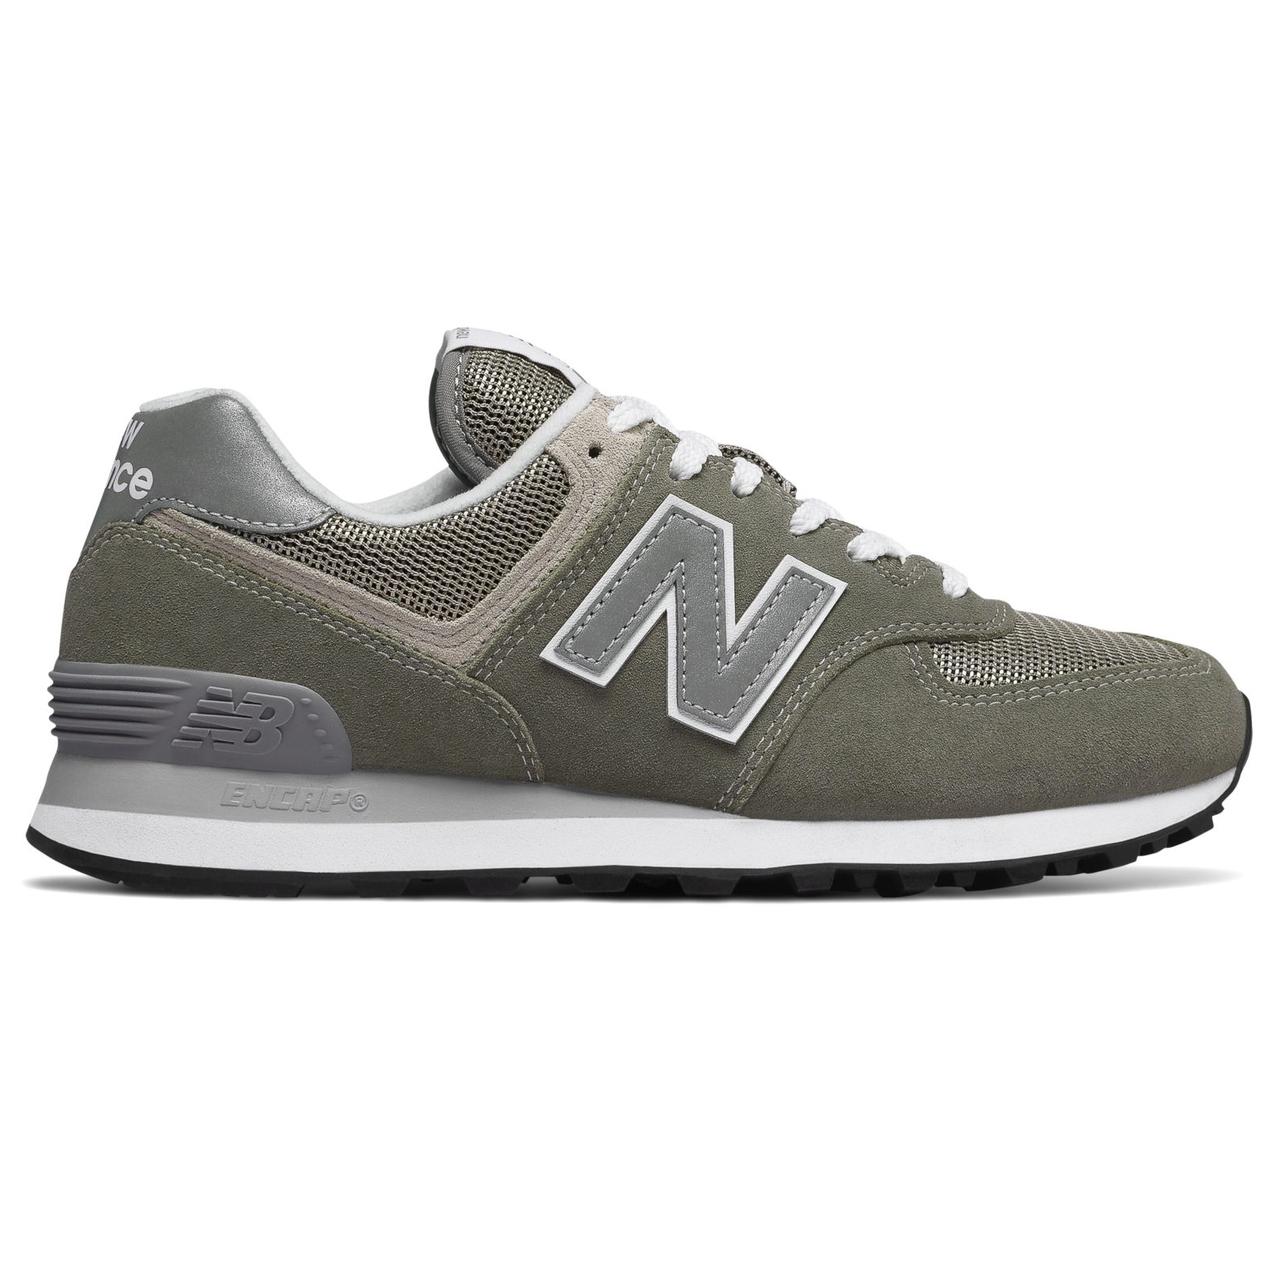 quality design 62ce0 3c213 New Balance 574 Women's Classics - Grey / White